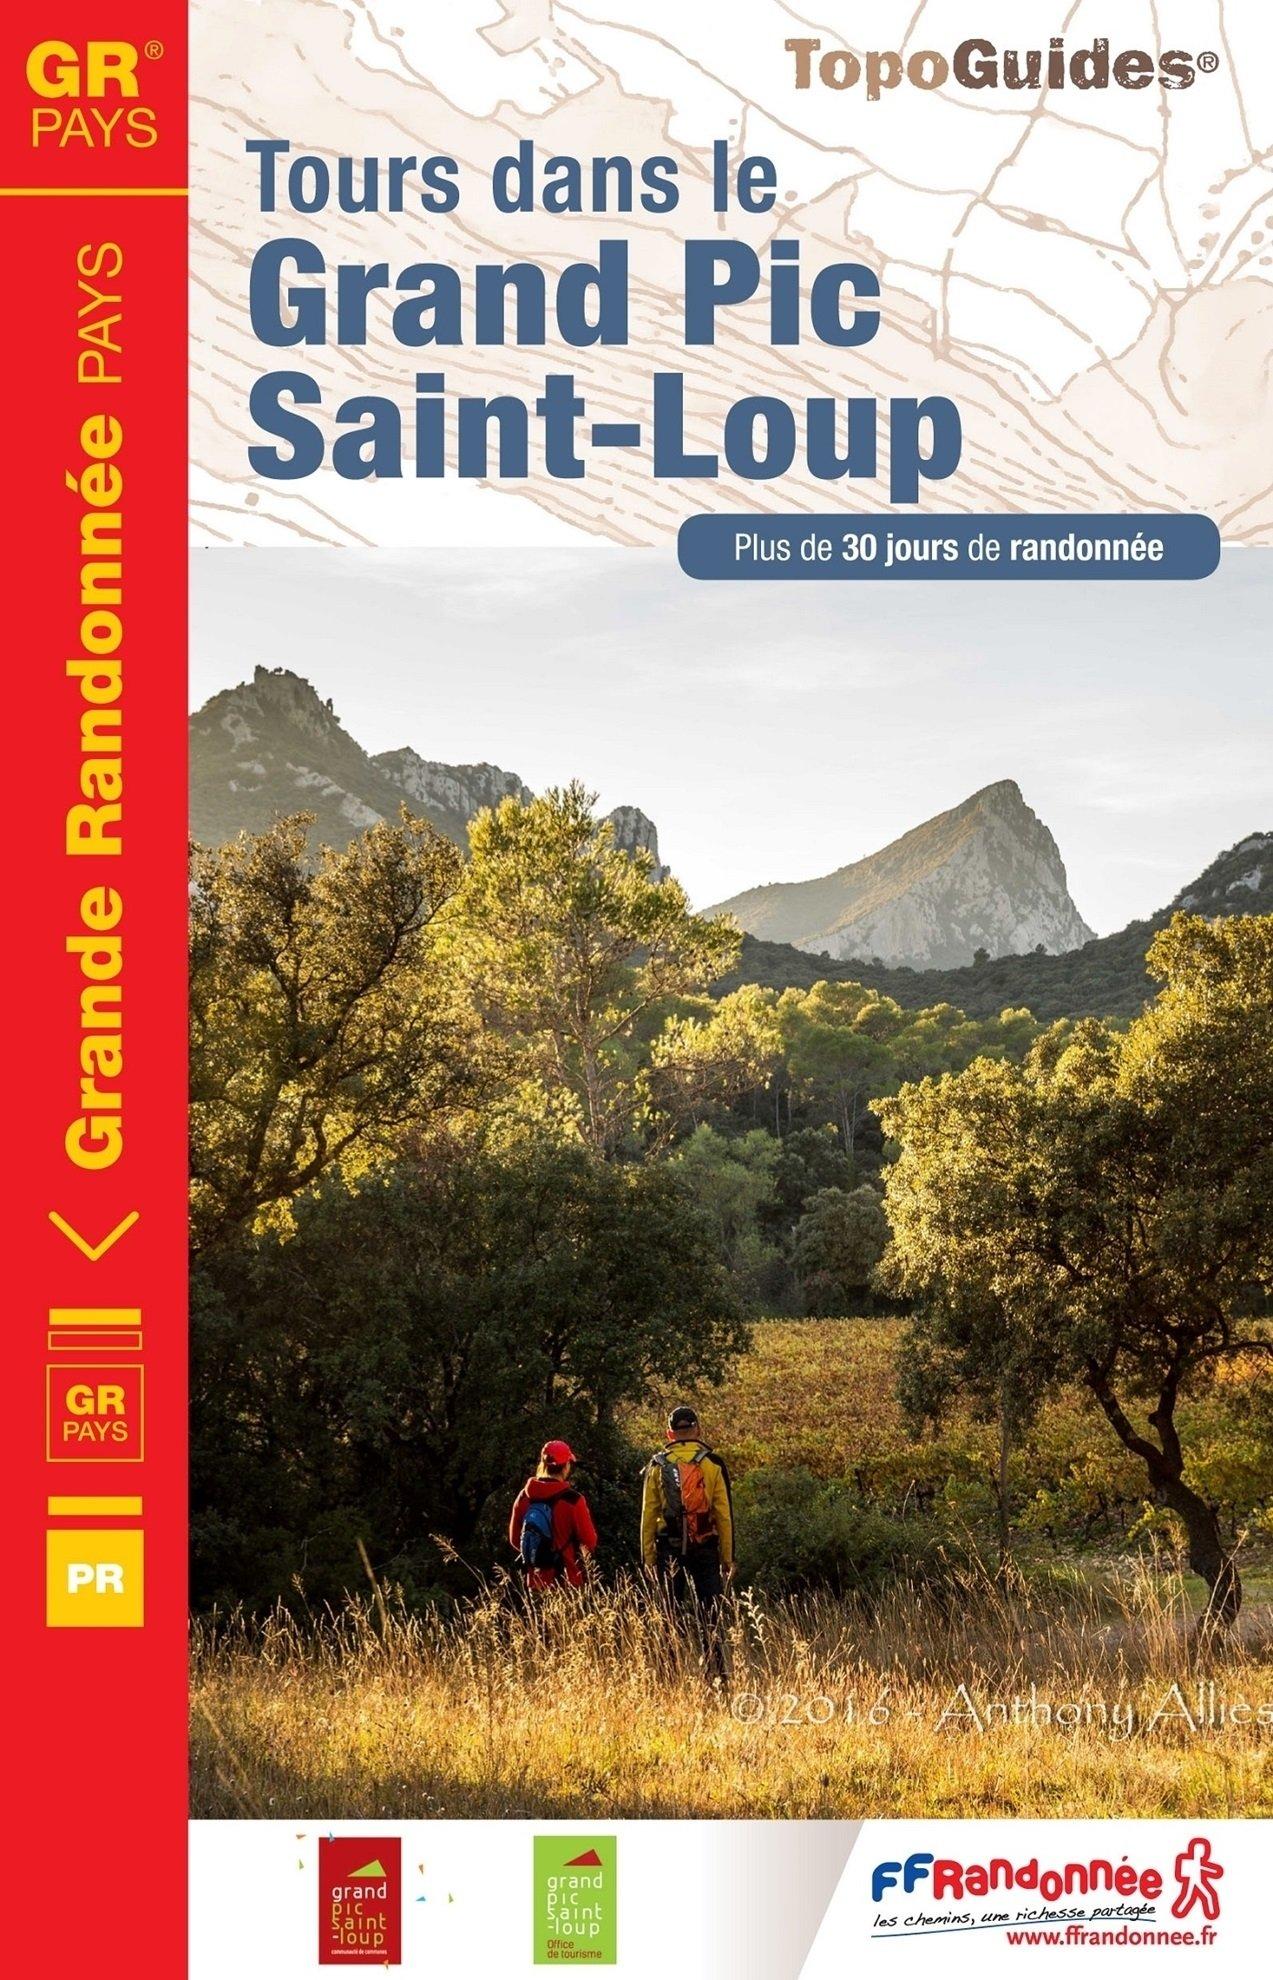 TG3401 Grand Pic Saint-Loup  | wandelgids GR3401 9782751408830  FFRP Topoguides  Meerdaagse wandelroutes, Wandelgidsen Languedoc, Hérault, Aude